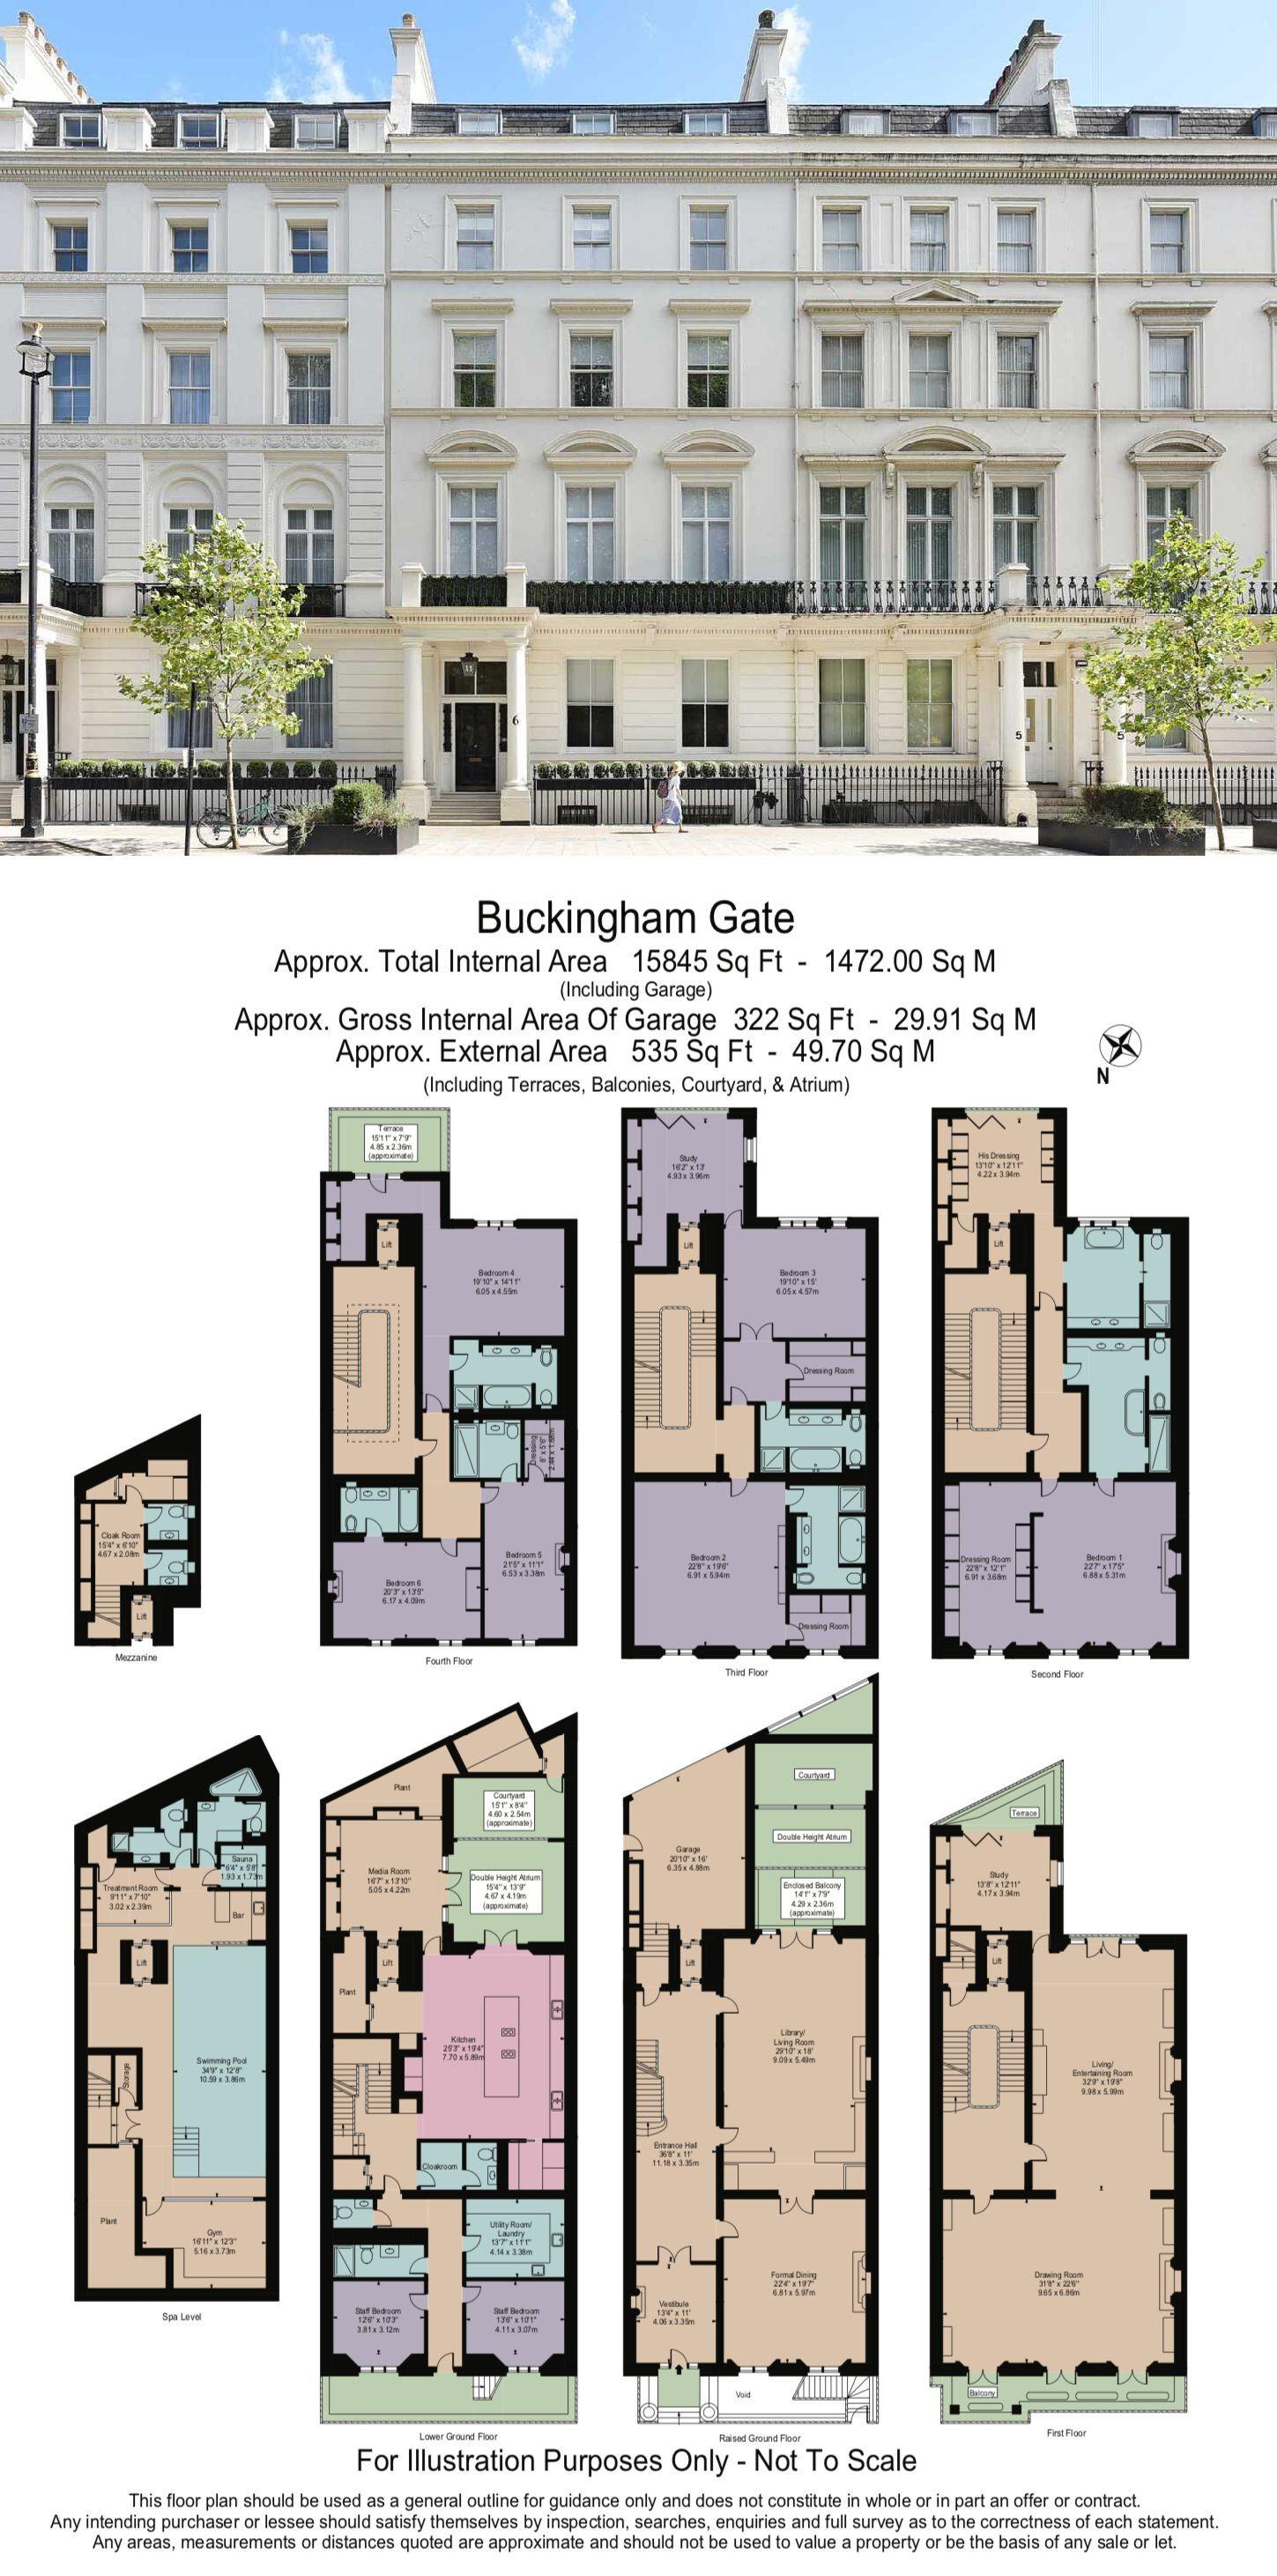 6 Bedroom Property For Sale In Buckingham Gate Sw1 60 000 000 Town House Floor Plan Mansion Floor Plan Architectural Floor Plans